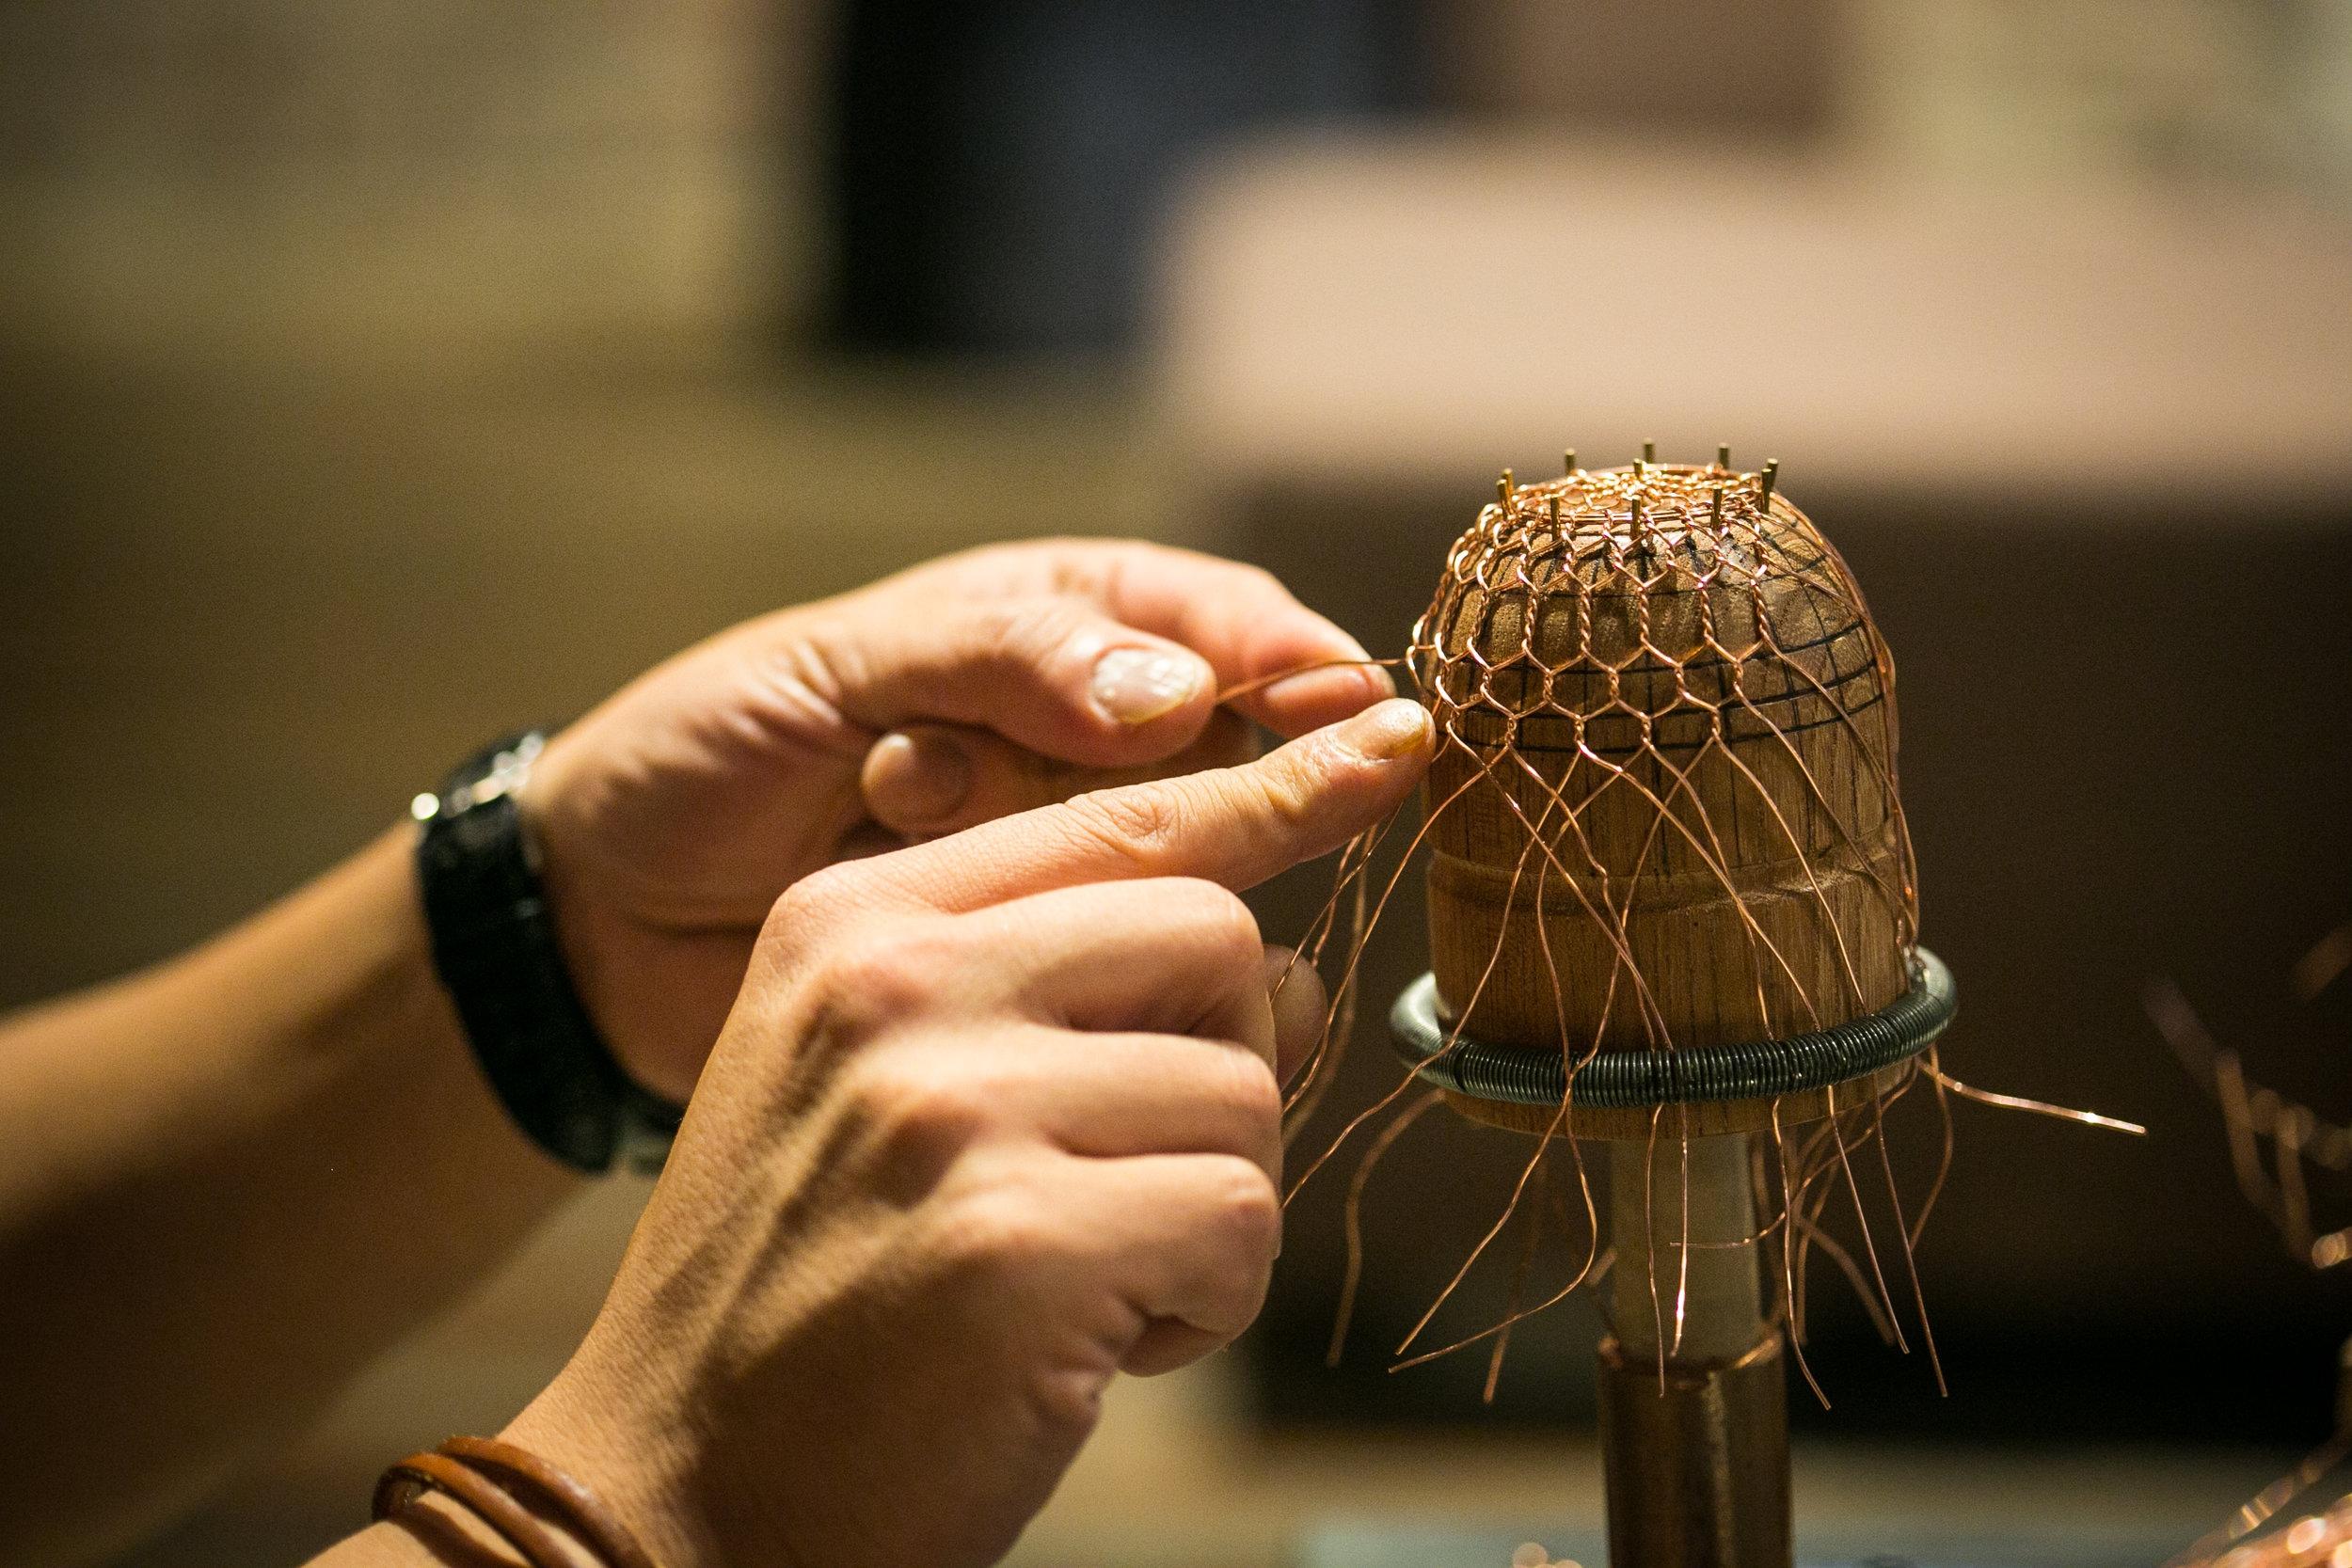 Les Ateliers Courbet Kanaami-Tsuji Craftsmanship Japan Kyoto Handmade Tea Utensils